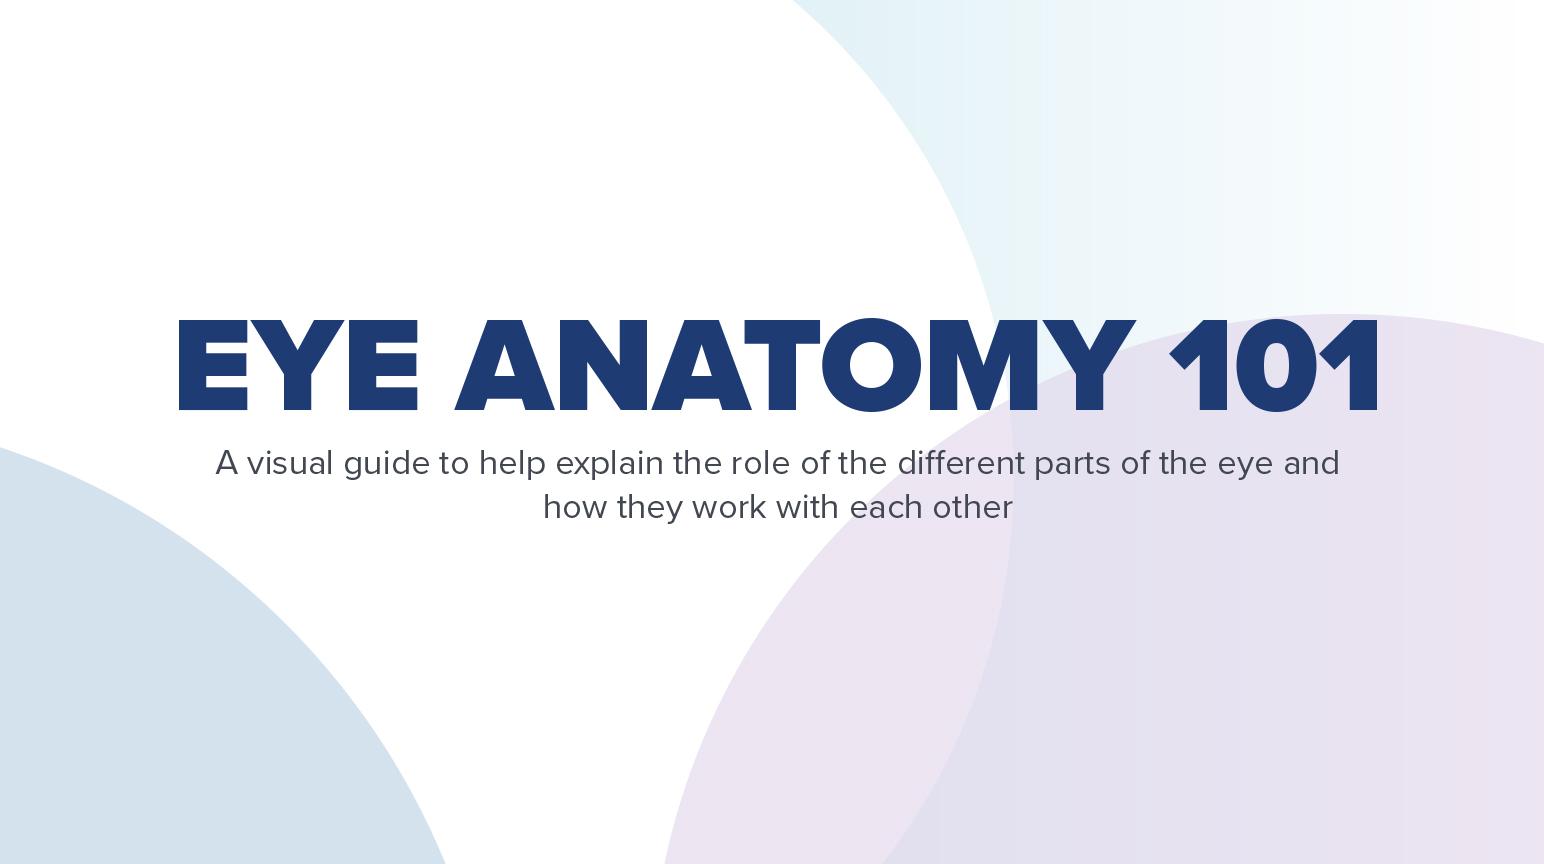 Eye Anatomy 101 (Infographic)